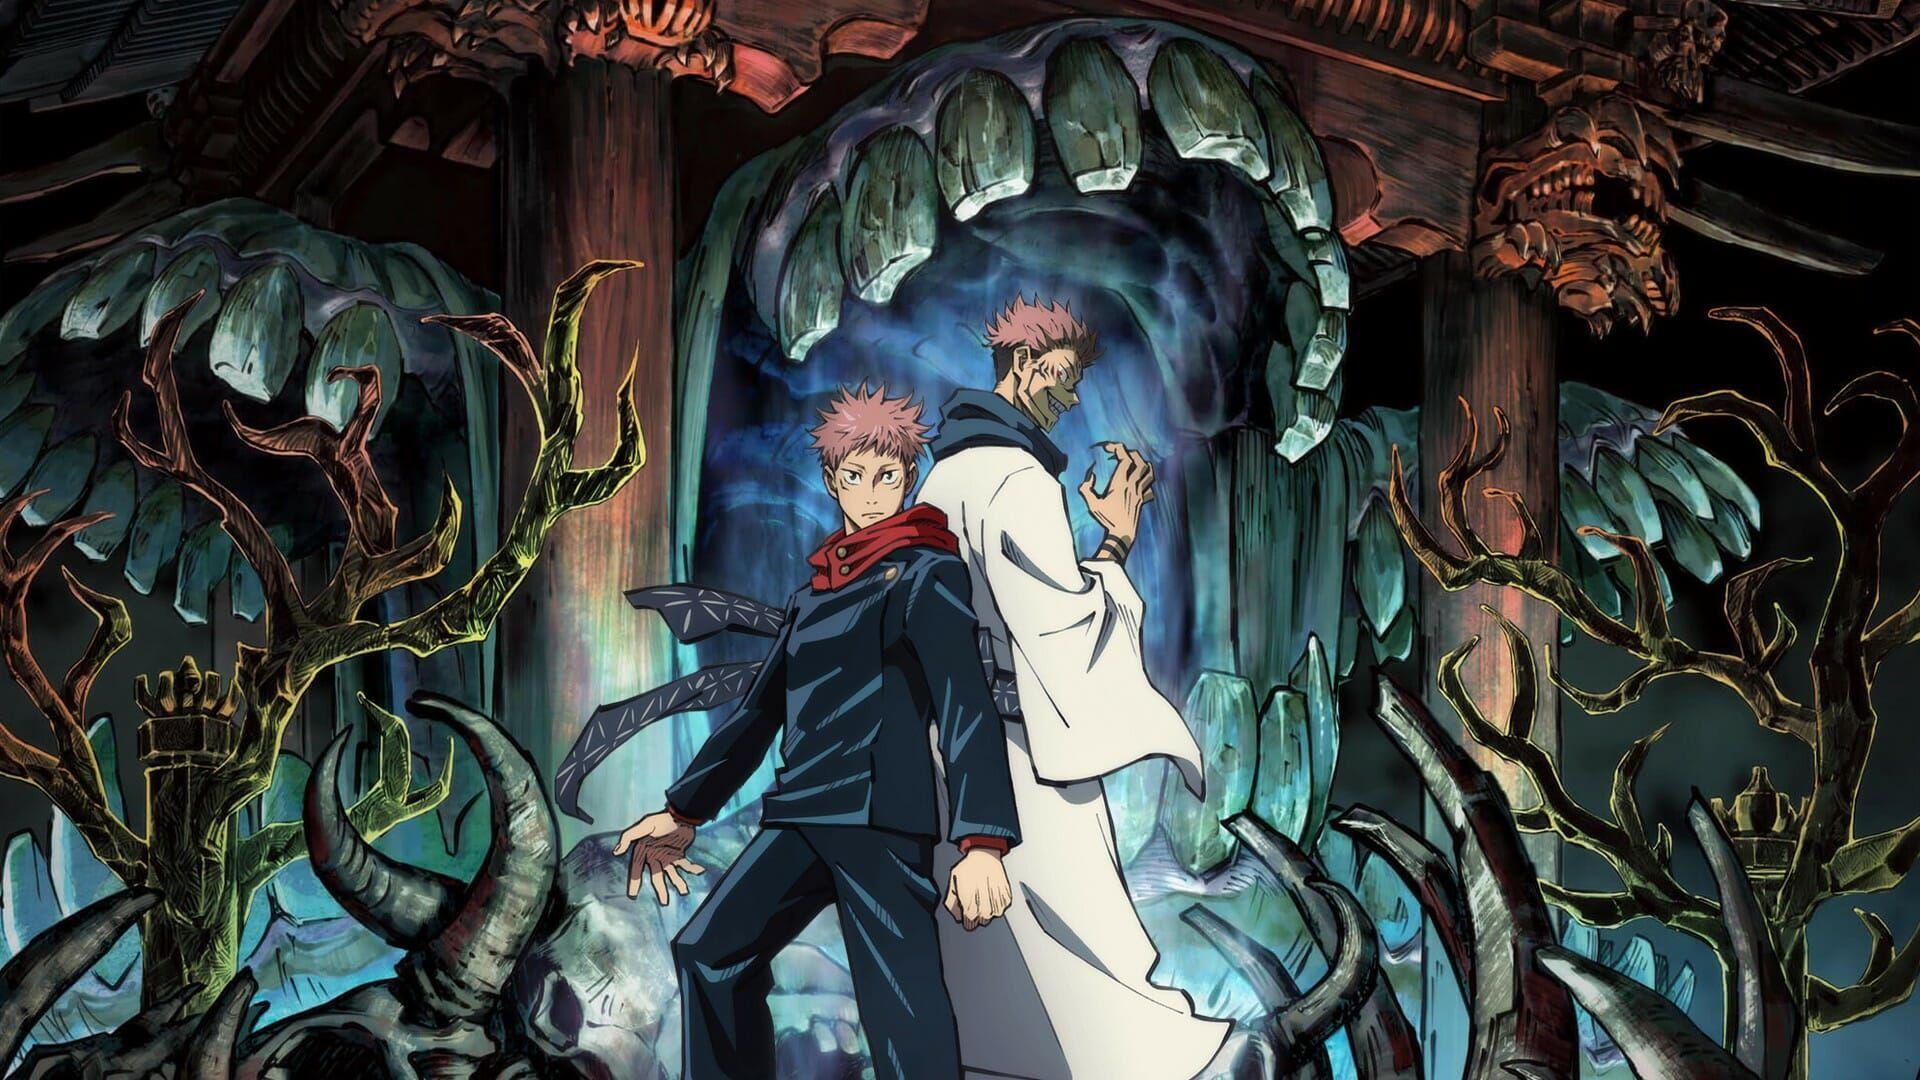 Previously On Bagogames Anime Impressions Jujutsu Kaisen Animeandmanga Animeandmangareview Crunchyroll Anime Jujutsu Crunchyroll